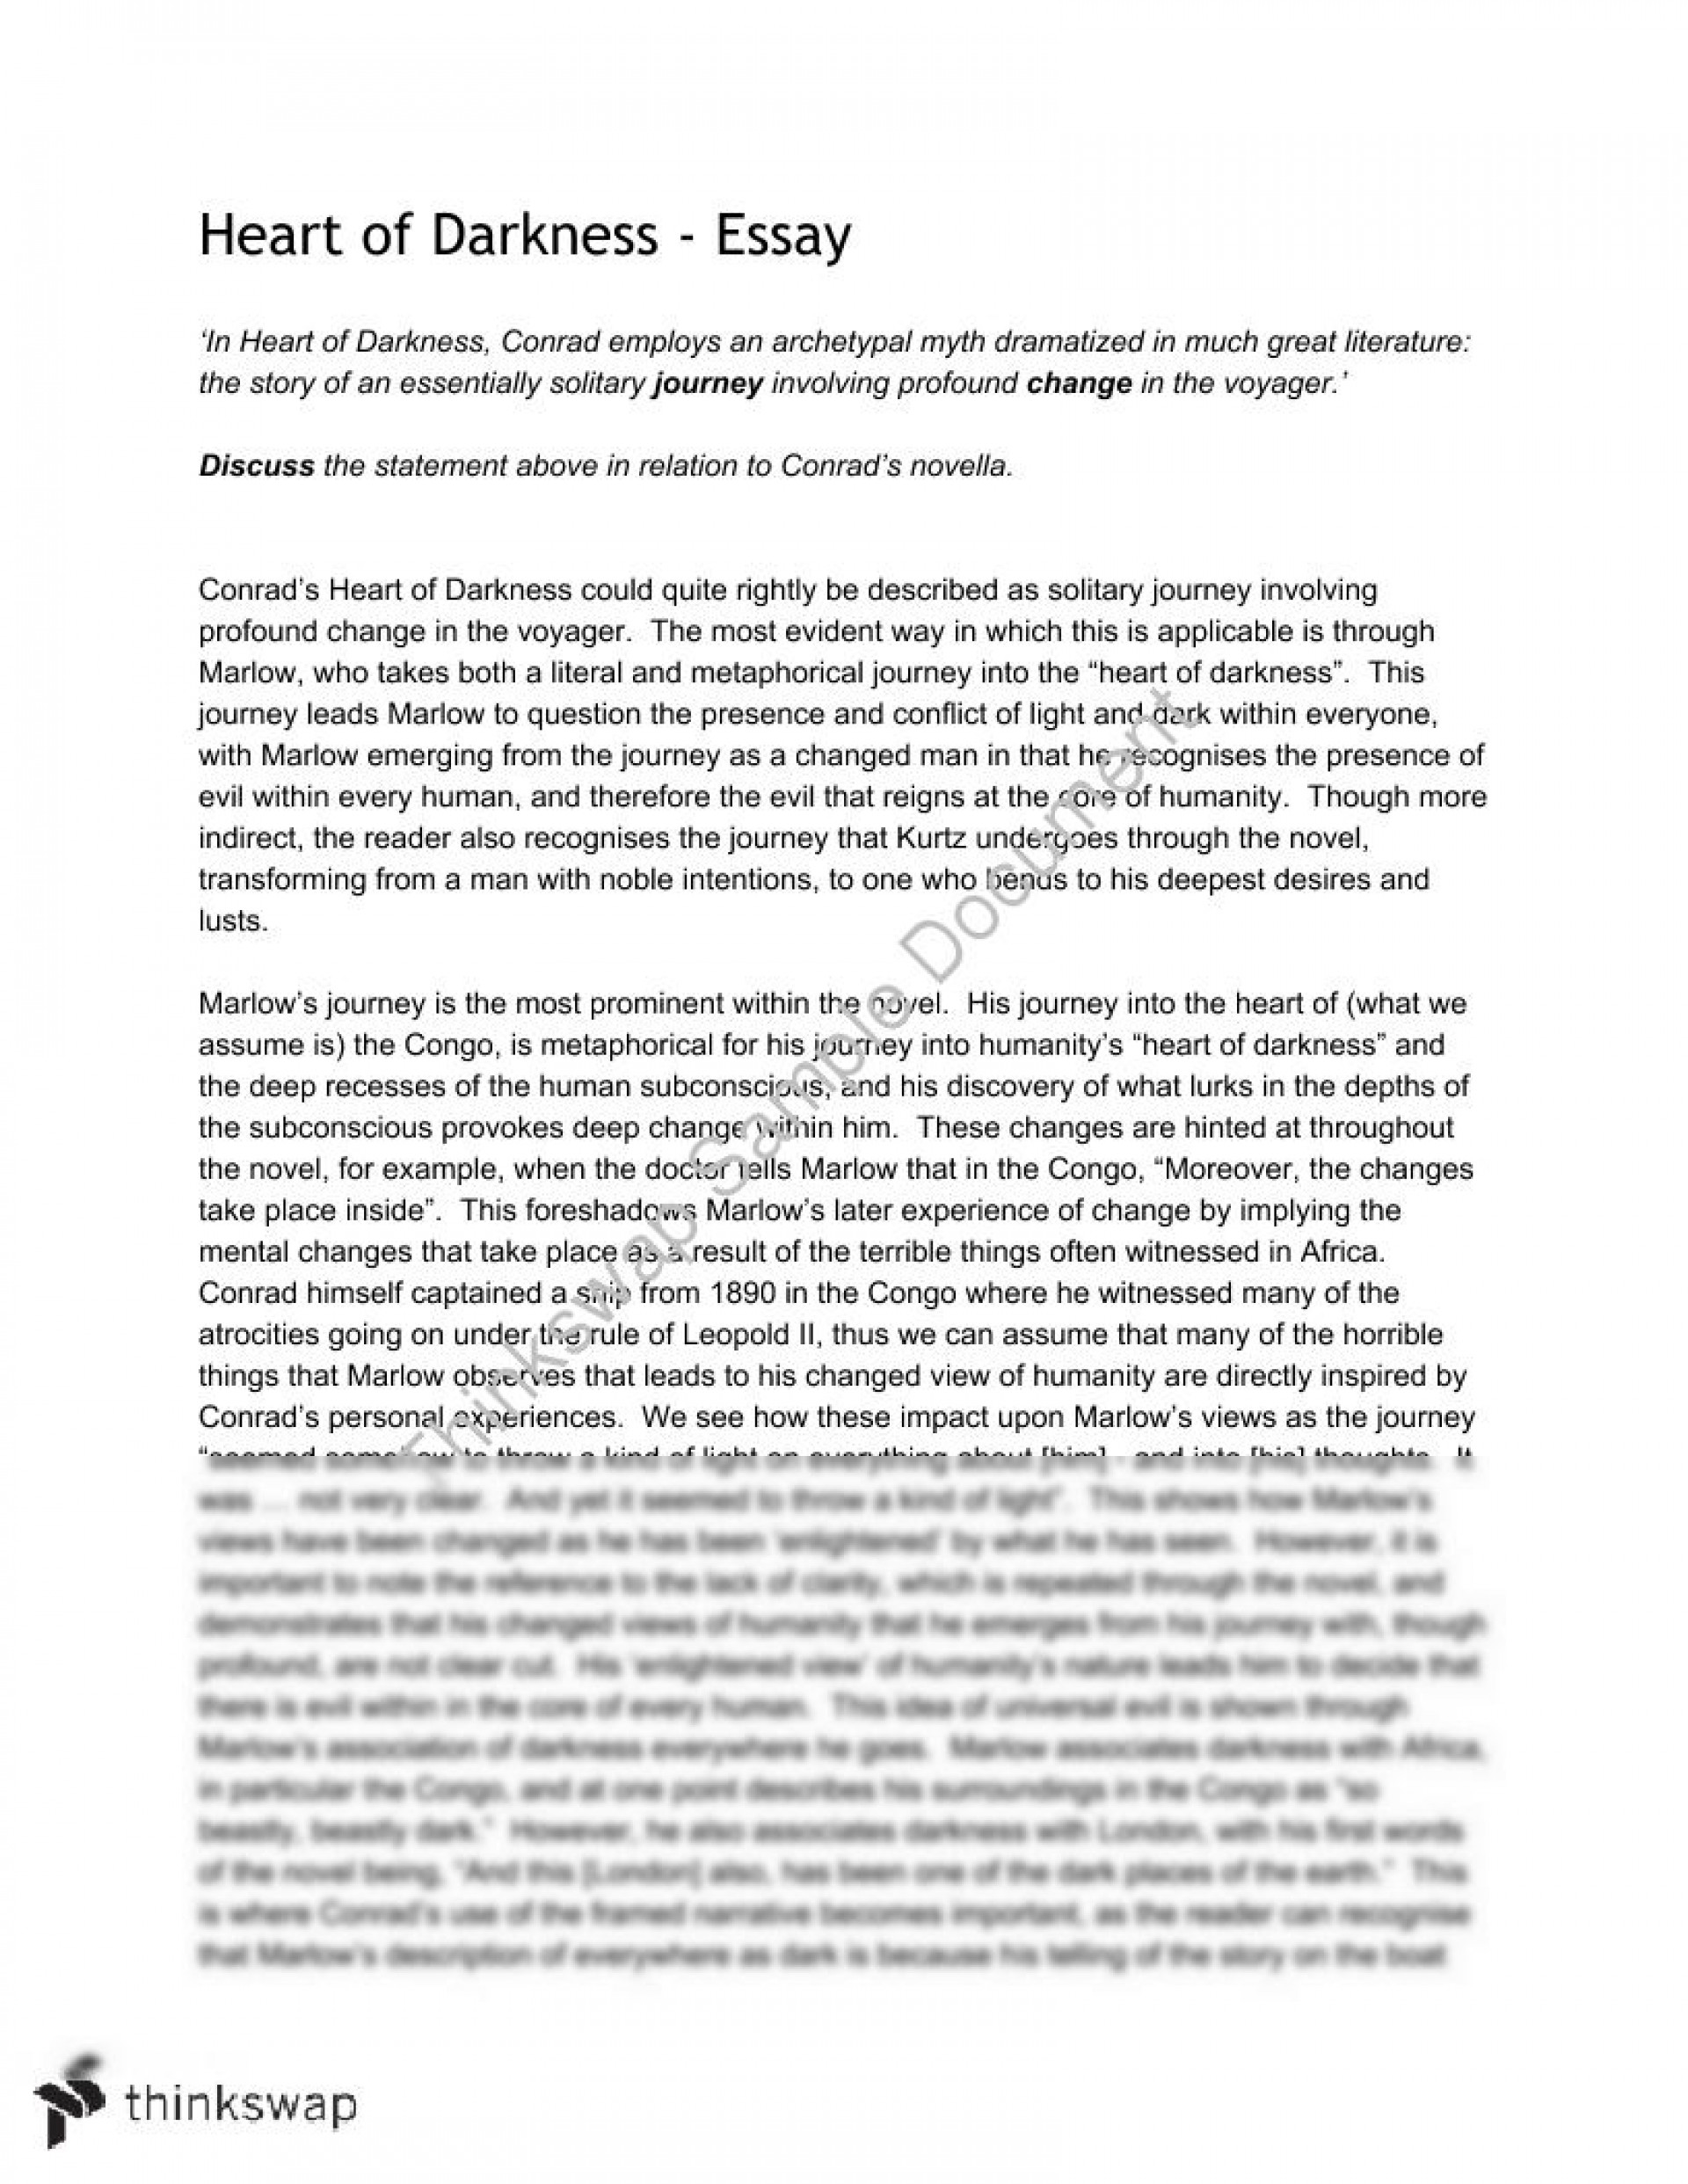 001 Essay Example Heart Of Darkness 60859 Heartofdarkness Fadded31 Wondrous Thesis Statement Topics Critical Essays Pdf 1920